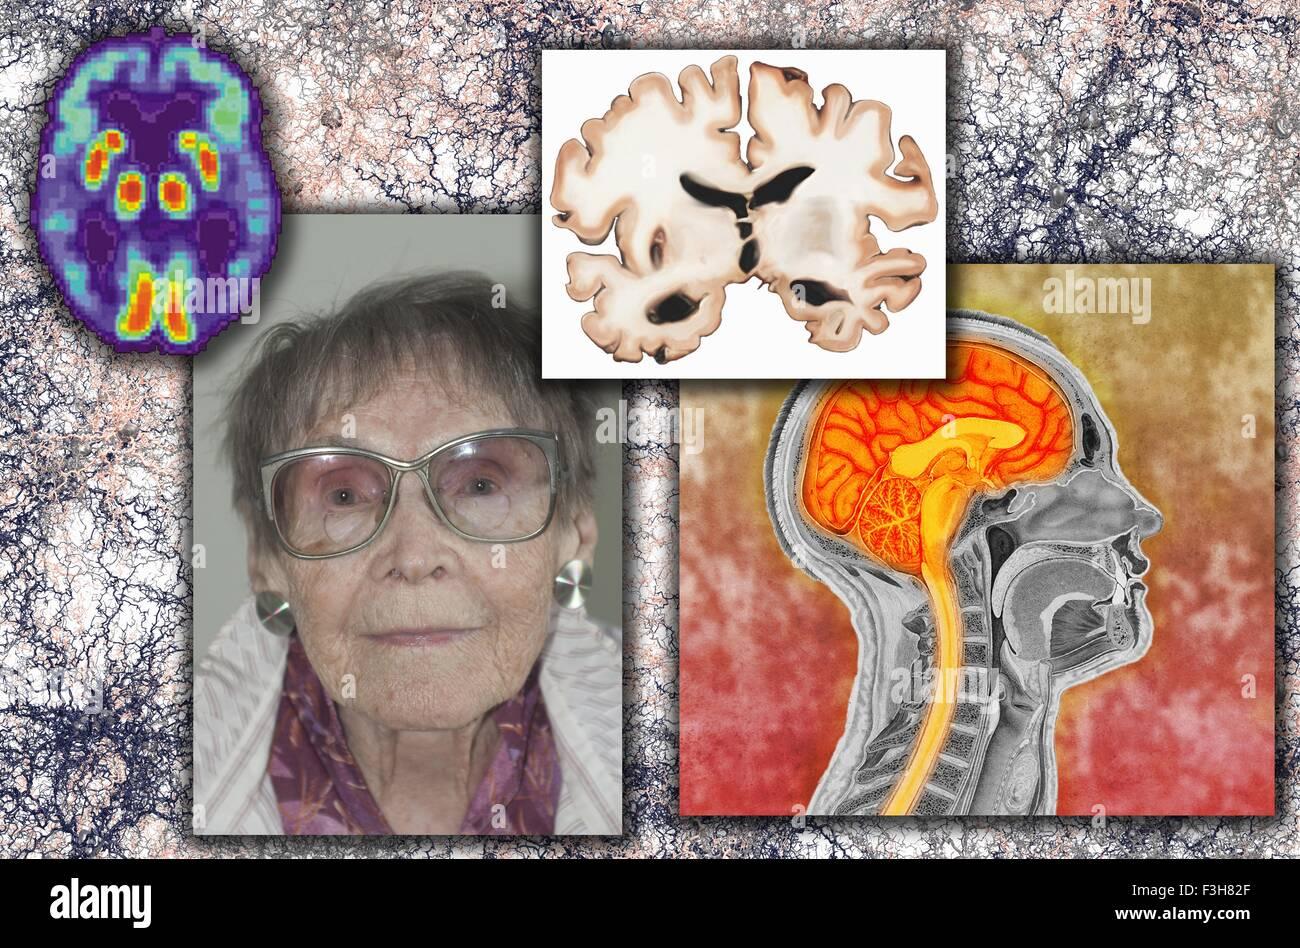 Ältere Frau Abbildung der Alzheimer-Krankheit Stockbild